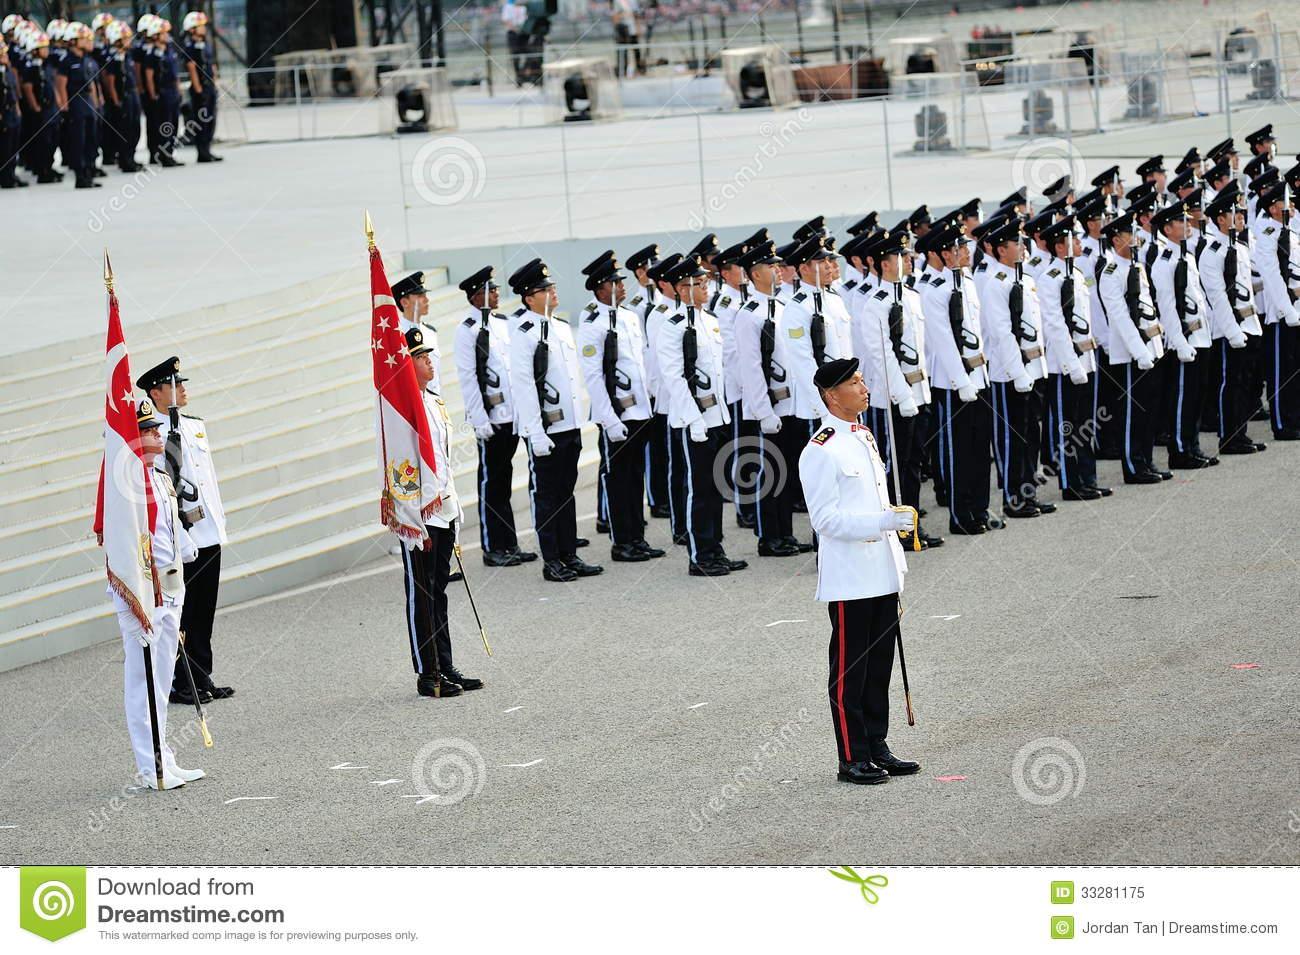 Parade commander clipart #18